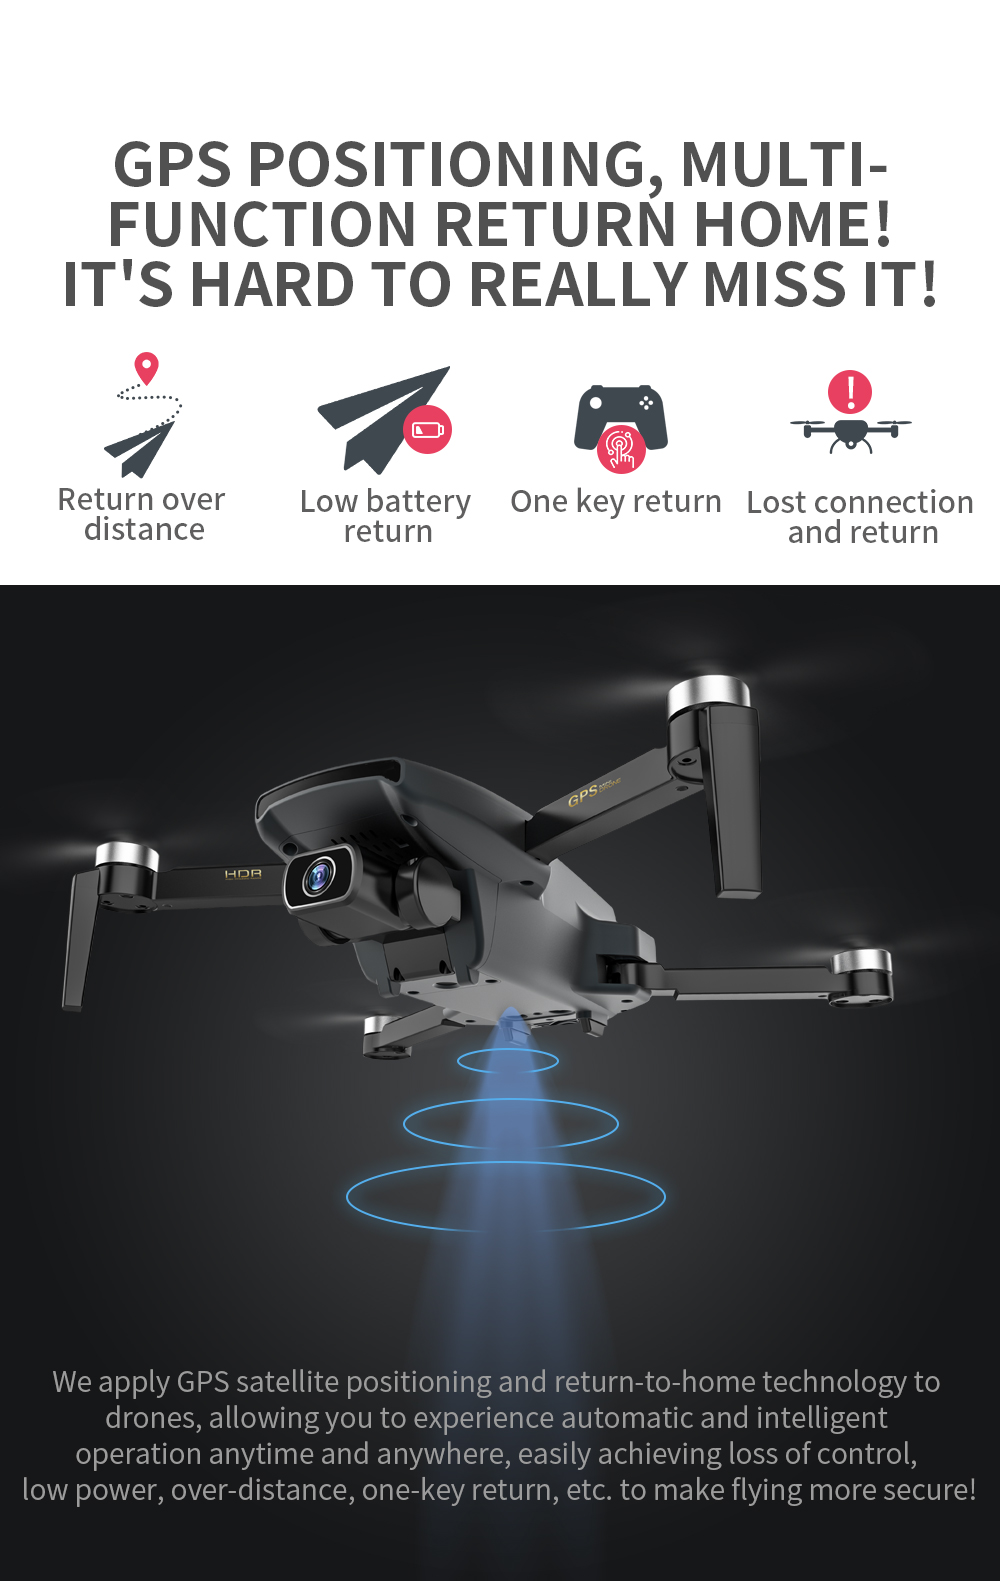 Ha642e09ef3e5499dbe308147faddd250U - ZLL SG108 Pro GPS Drone With 5G Wifi FPV 4K HD Dual Camera Brushless RC Foldable Quadcopter 1000m Control Distance Dron VS KF102